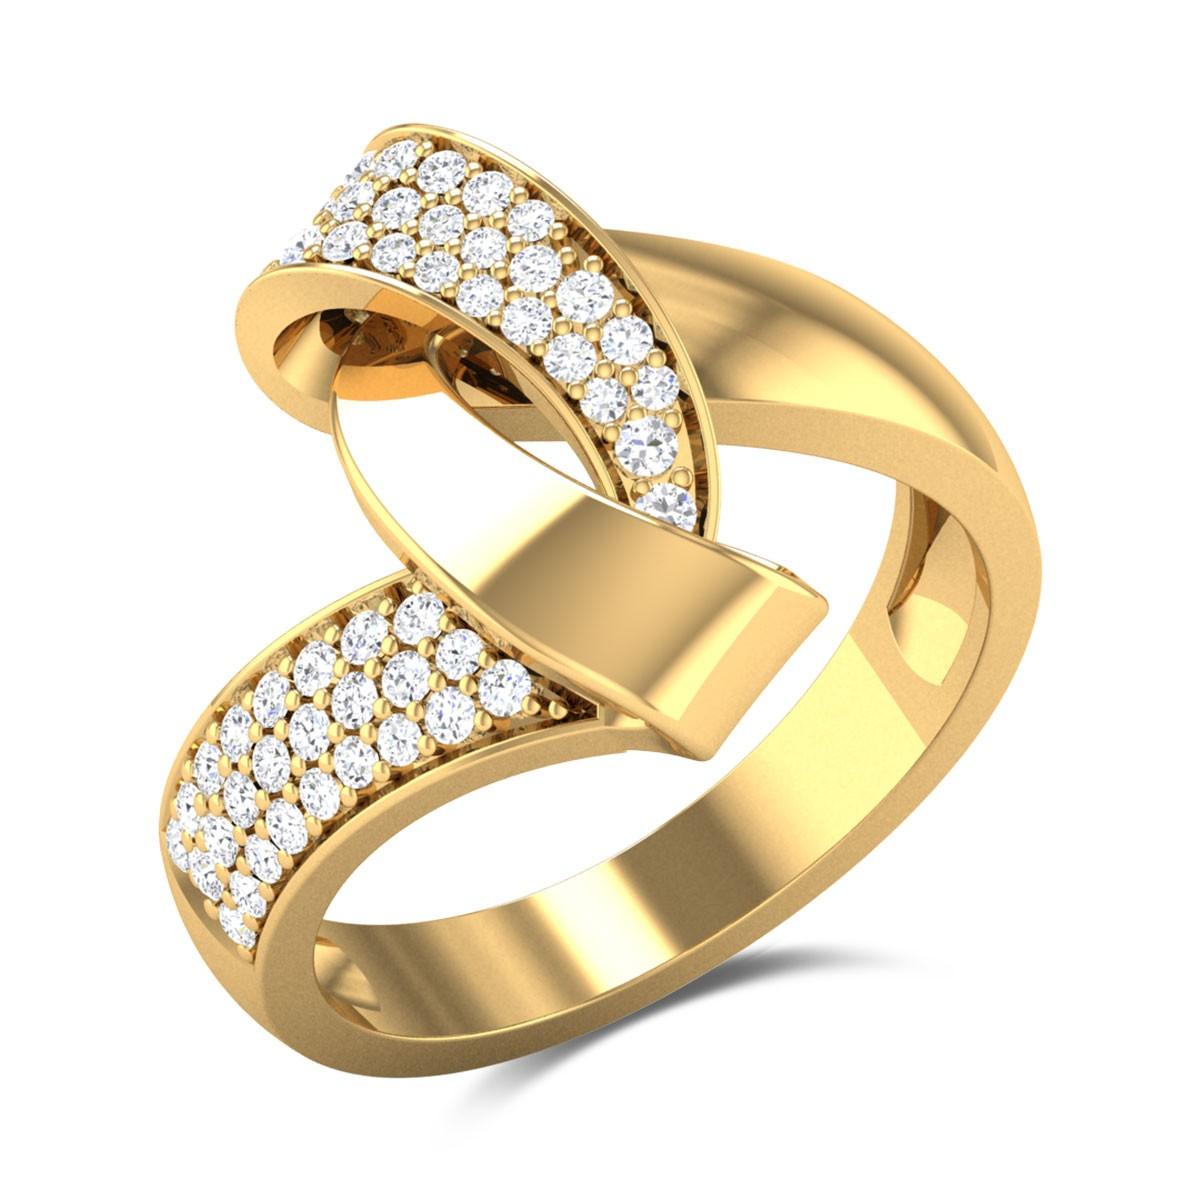 Ailis Diamond Ring